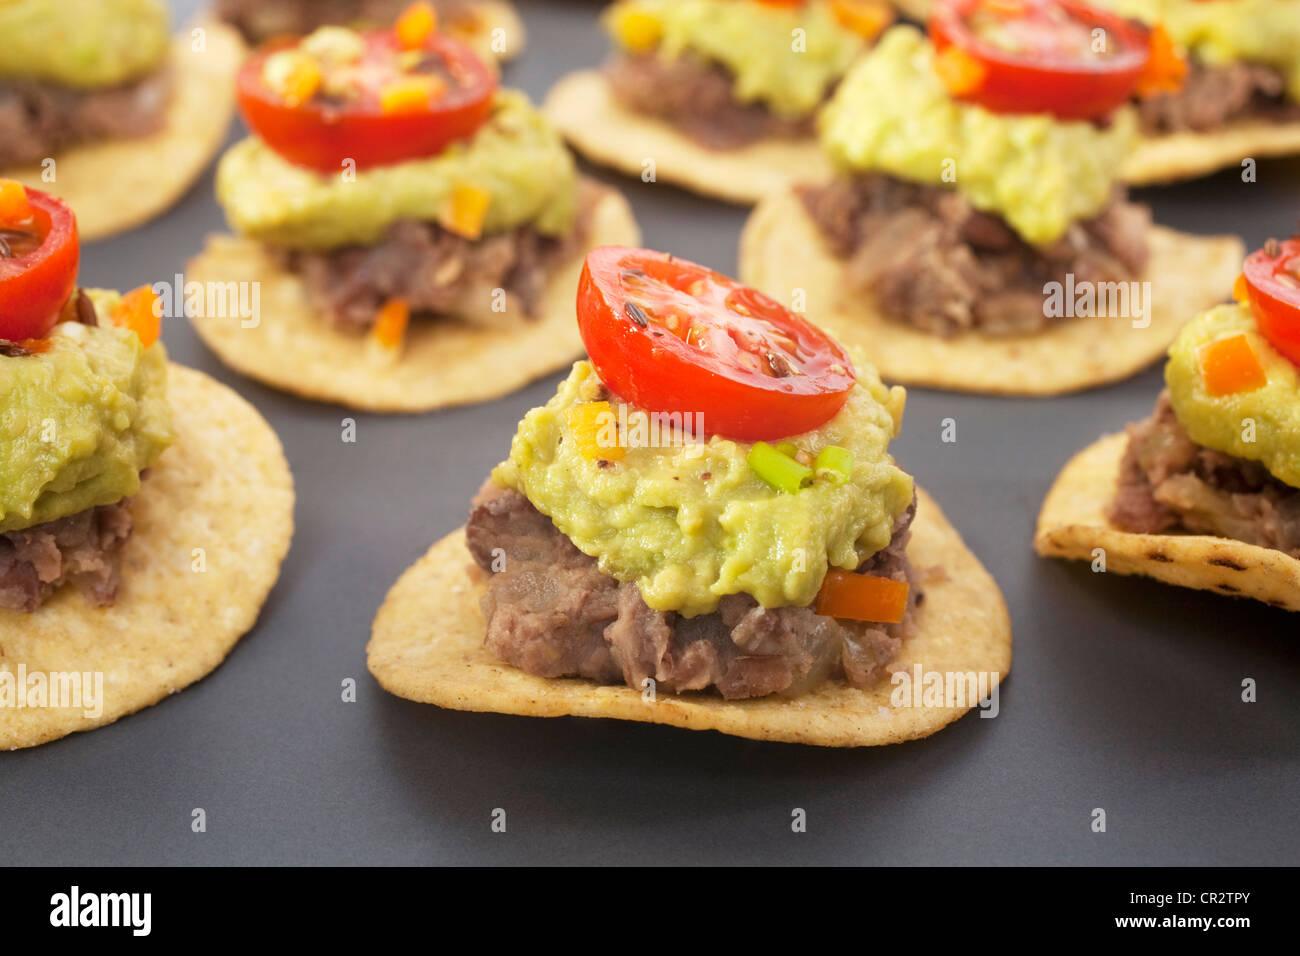 Fiesta Mexicana picante comida, chips de maíz, coronado con frijoles refritos, aguacate y salsa de tomate. Imagen De Stock